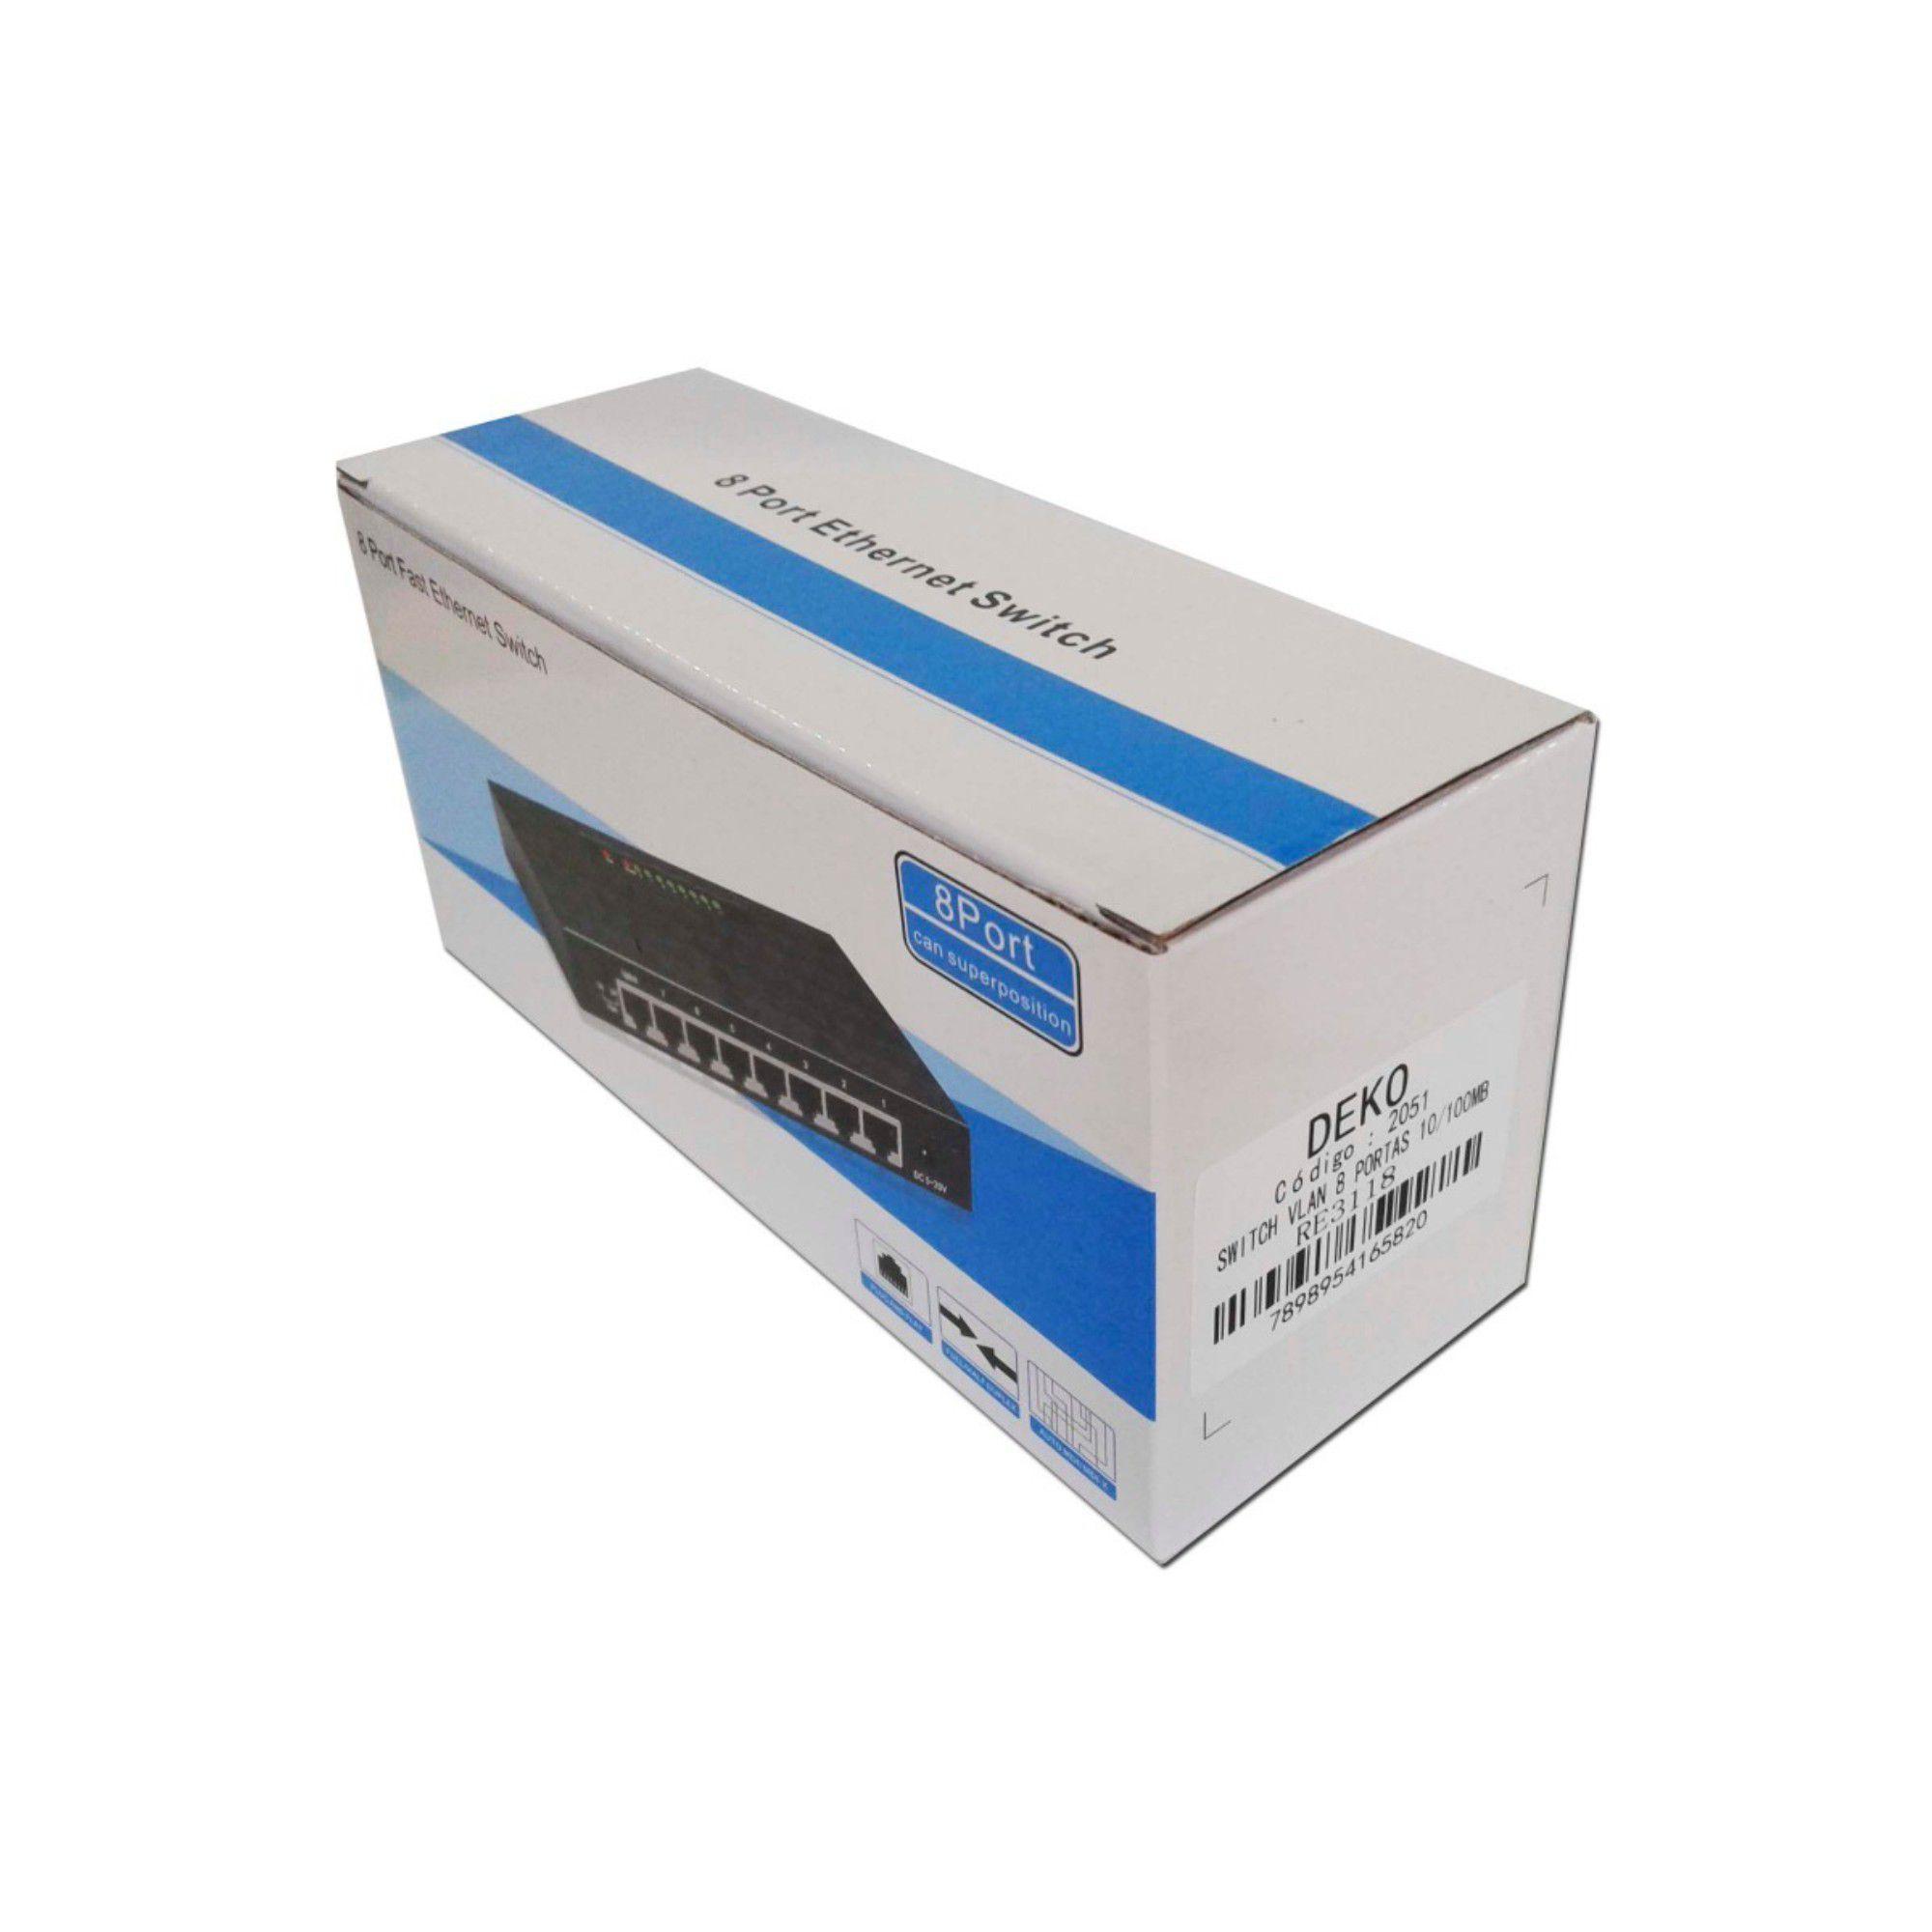 Switch 8 portas 10/100Mbps DEKO